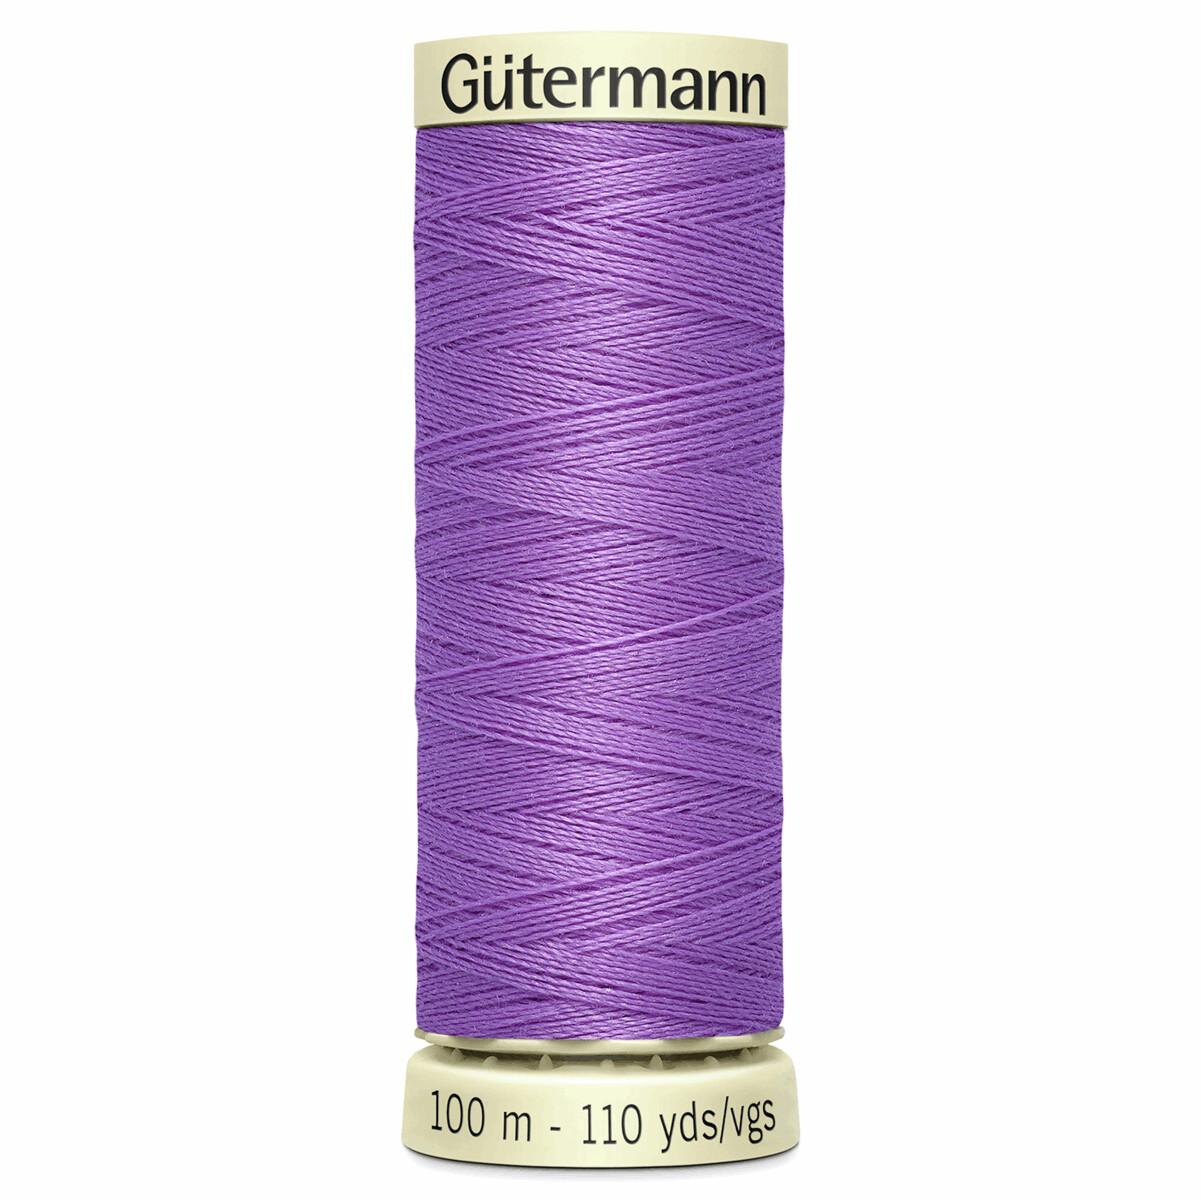 Gutermann Sew-All thread 291